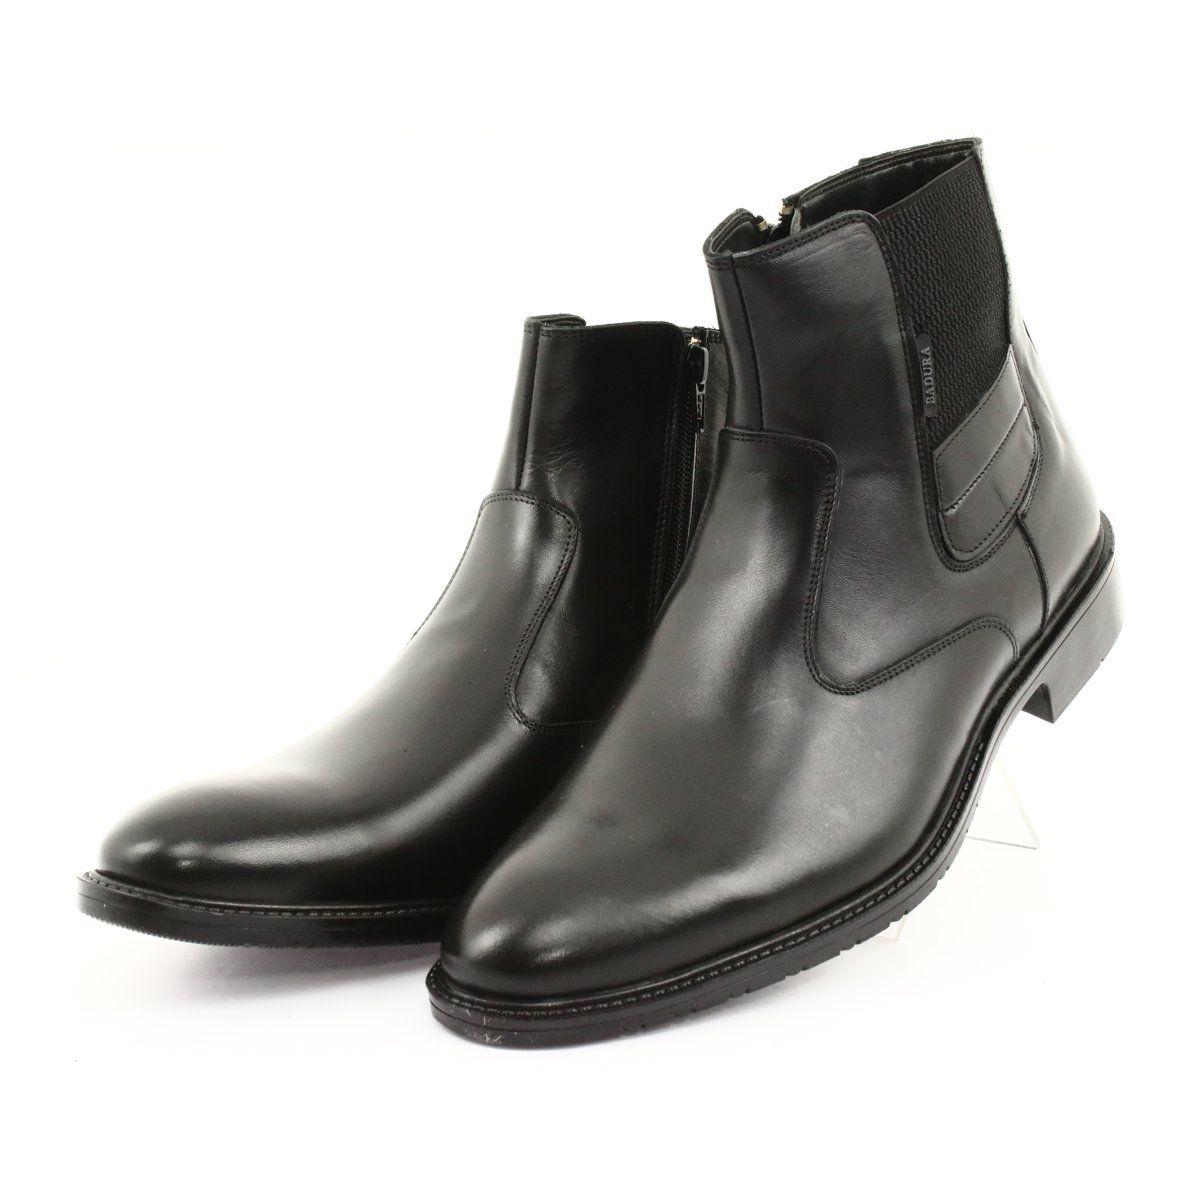 Elastic Sides Men S Badura Jodhpur Boots Badura 4797 Black Elegant Boots Jodhpur Boots Boots